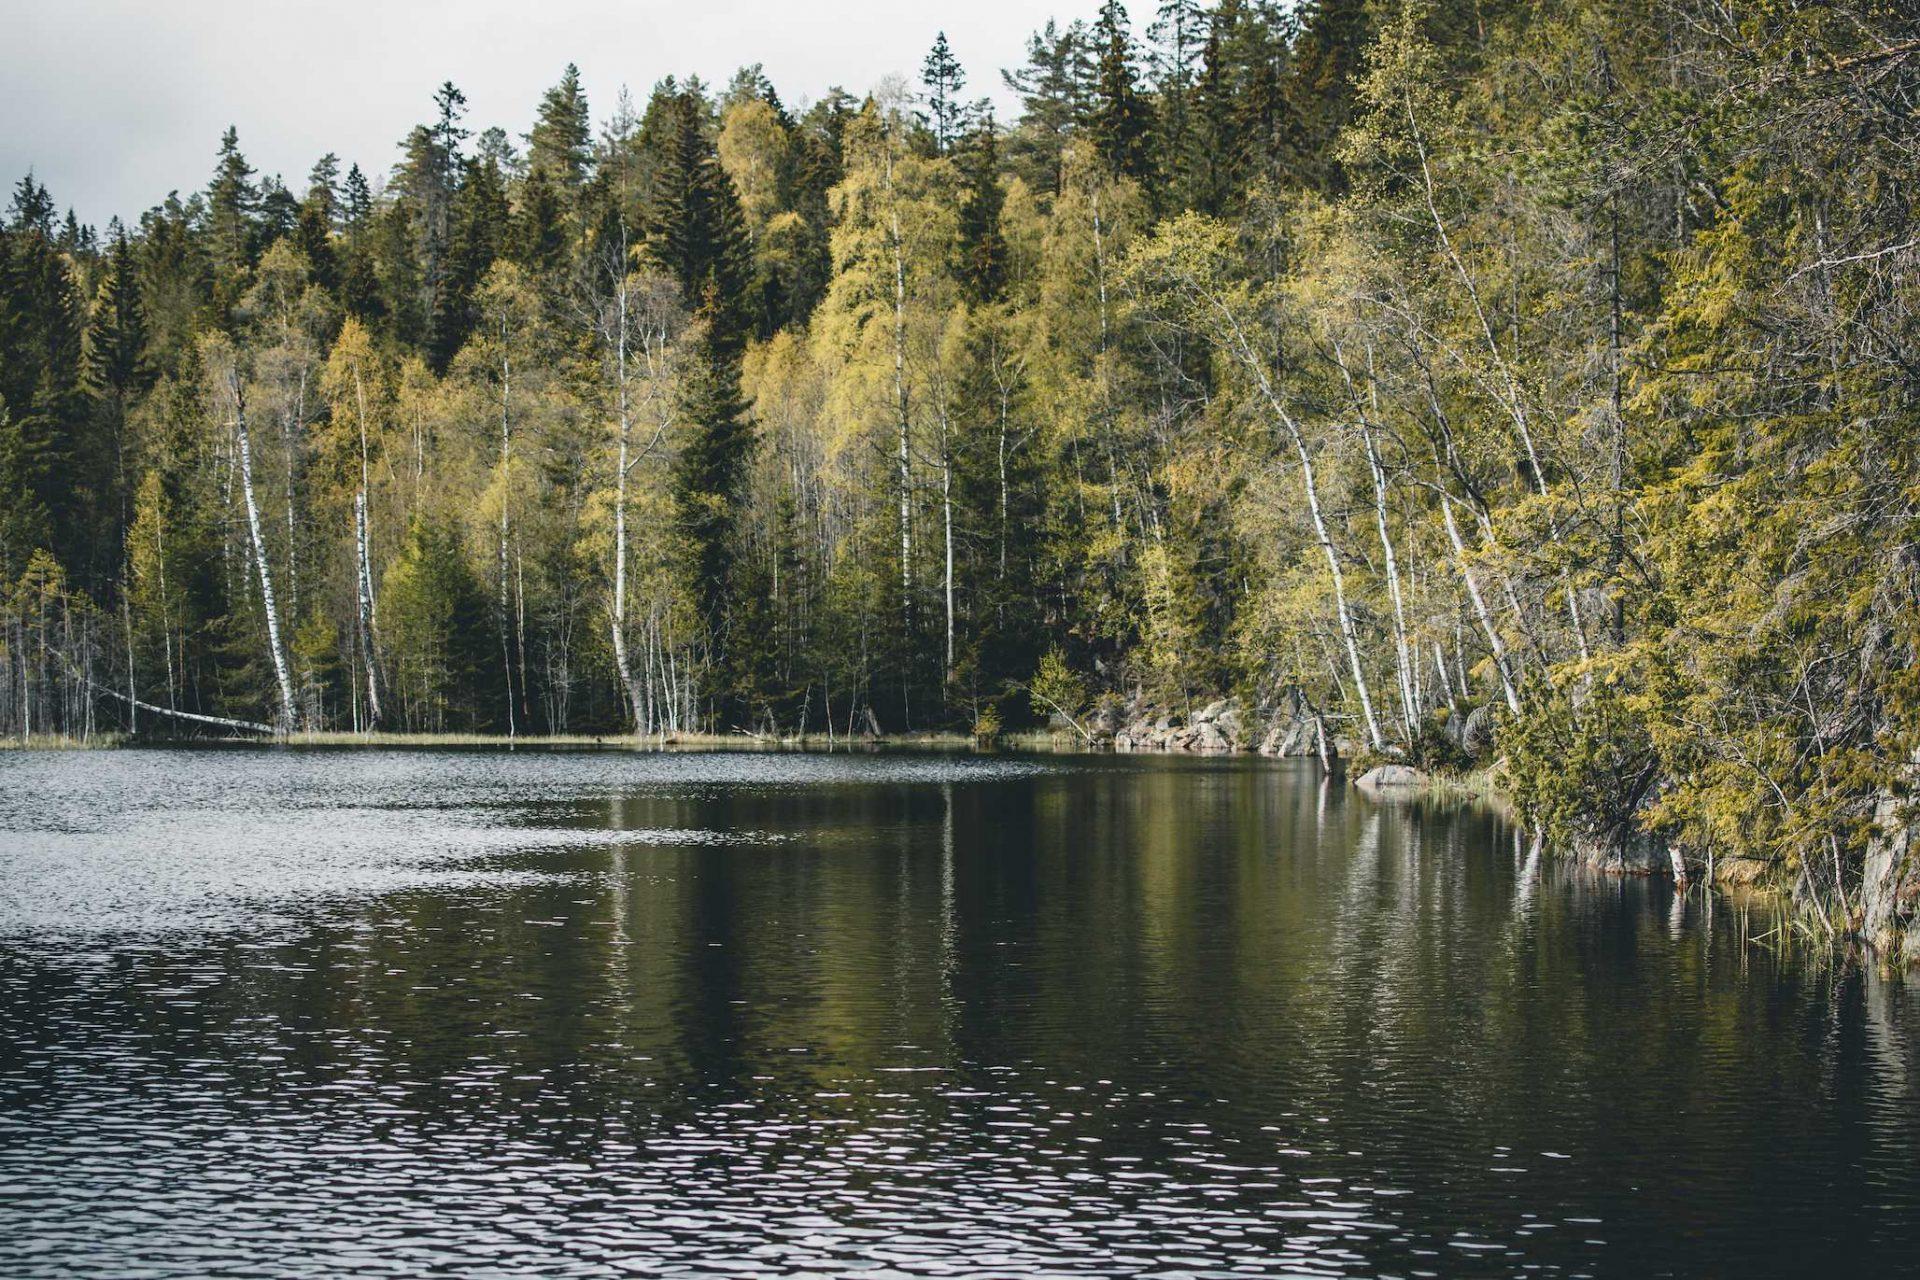 ciekawe miejsca wokolicach Drammen